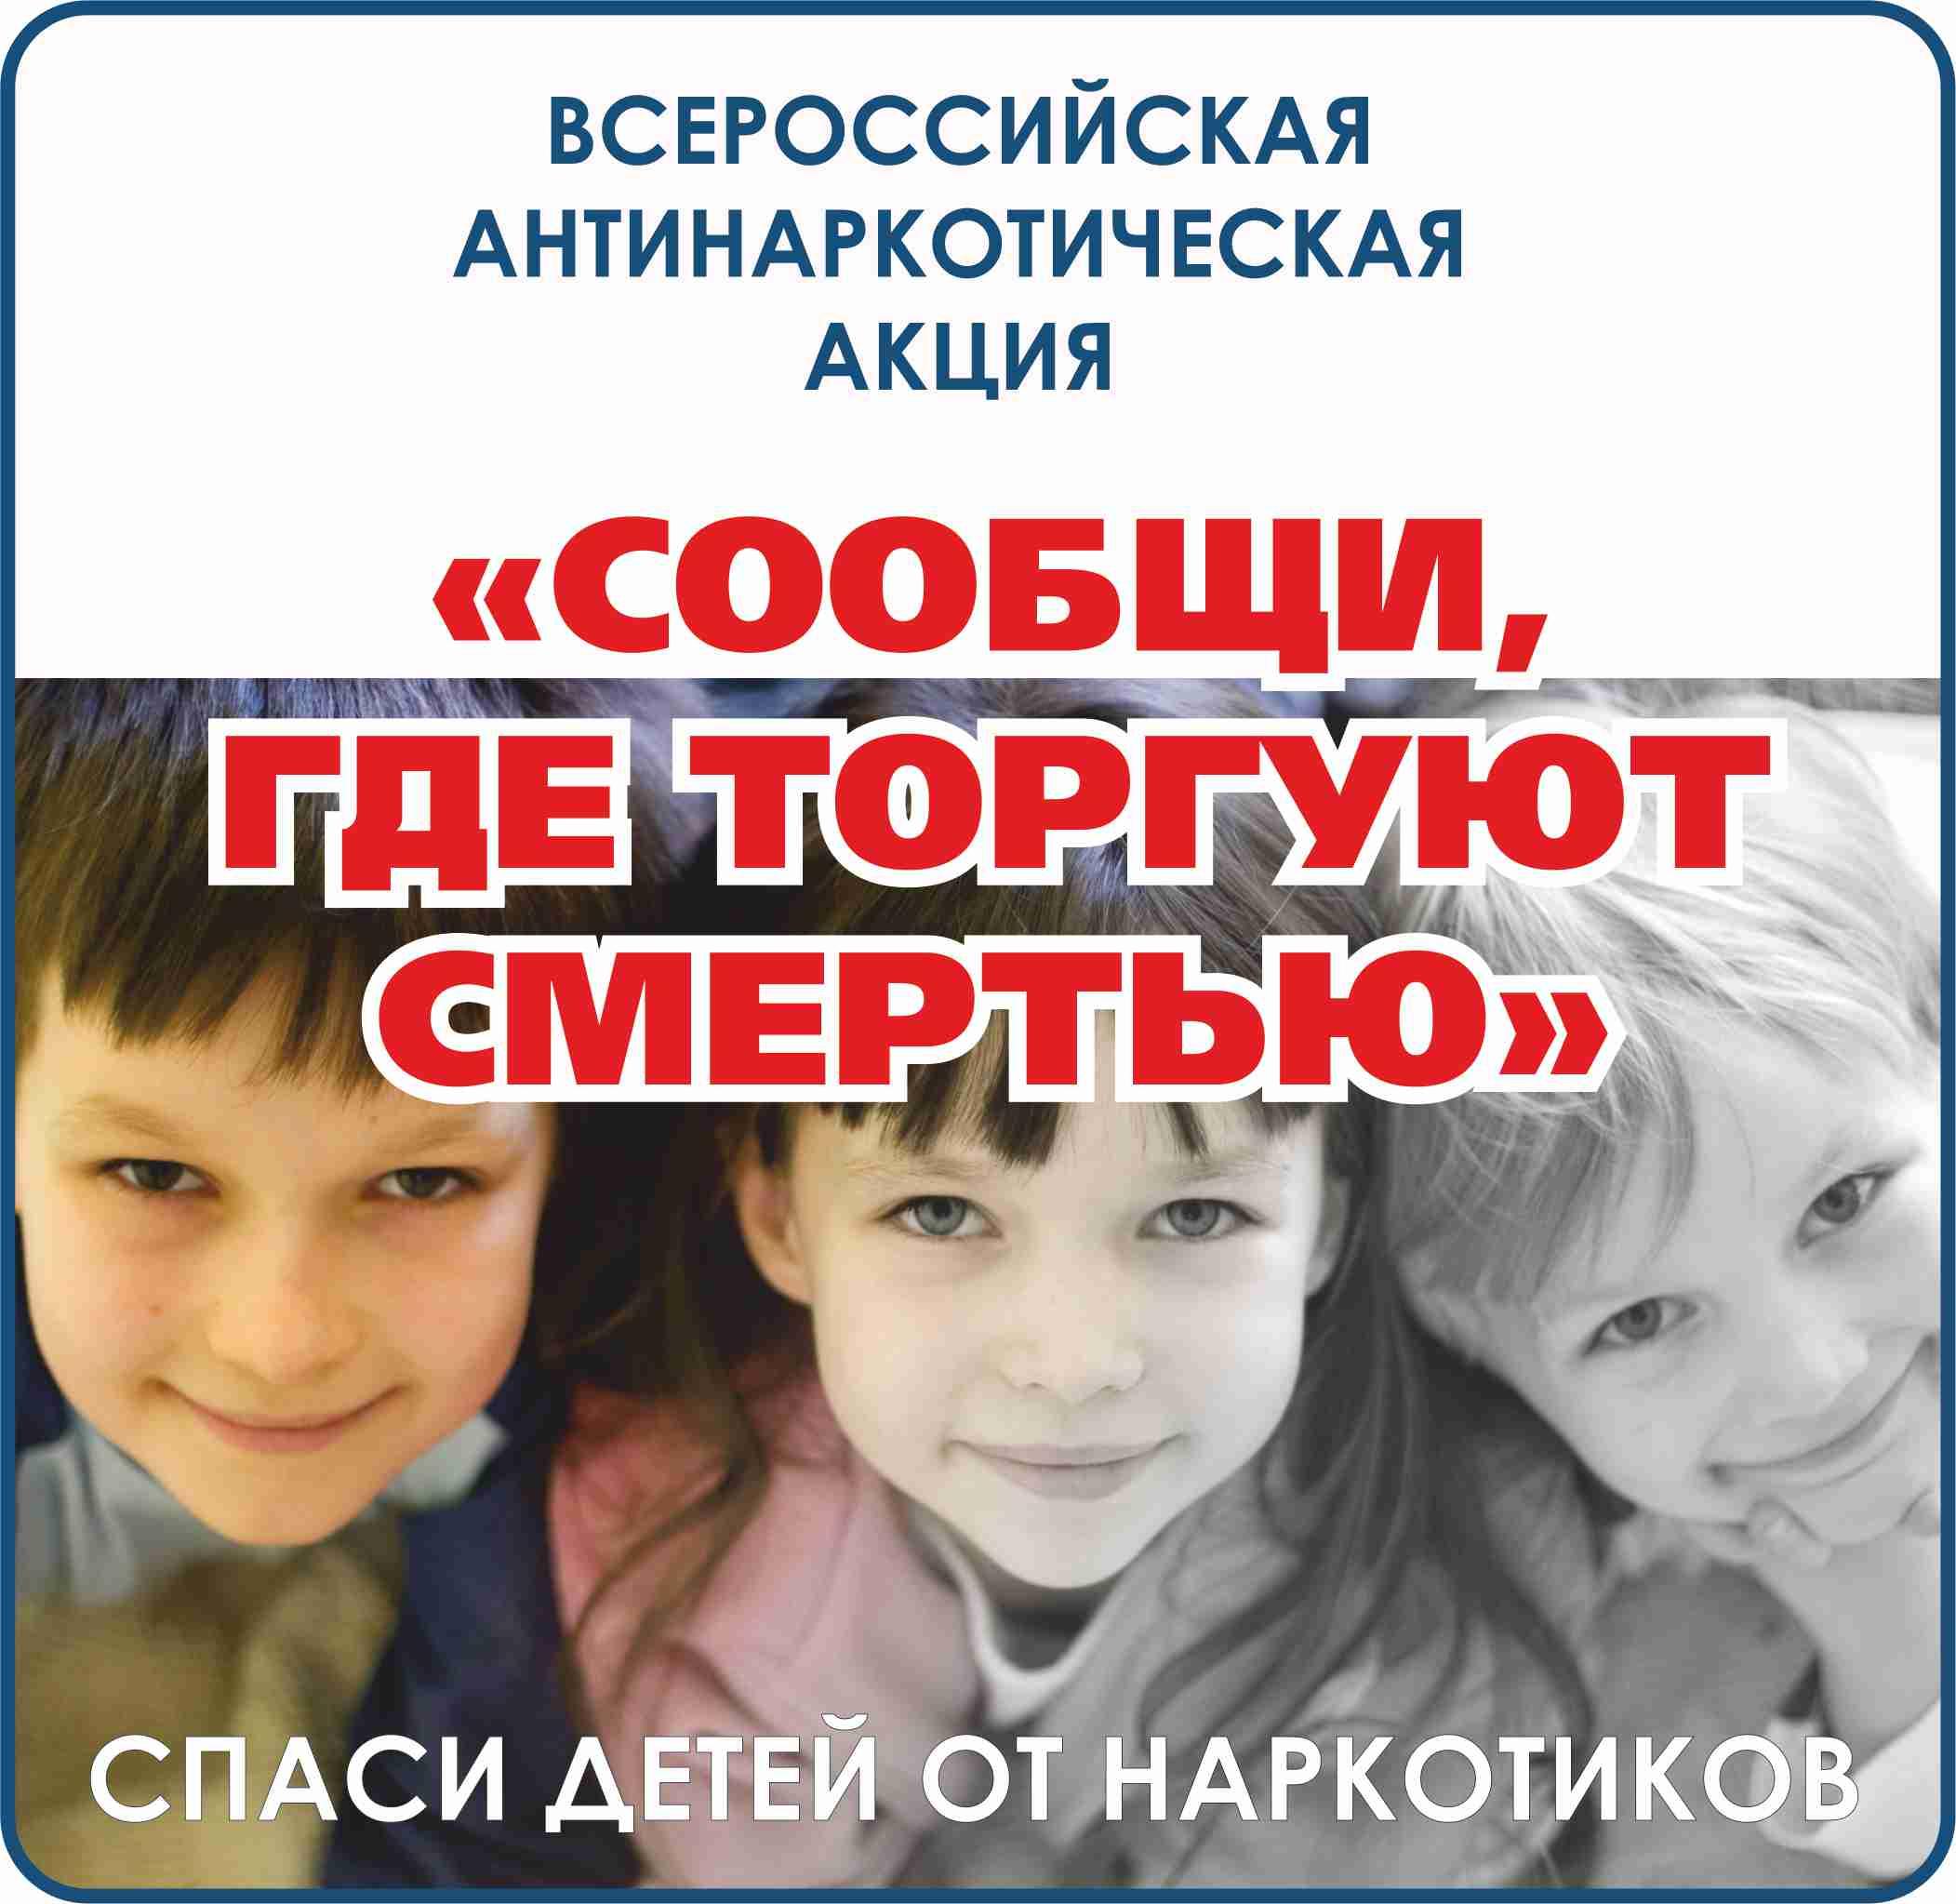 http://site.igis.ru/blog/media/10865/1489388634870473.jpg